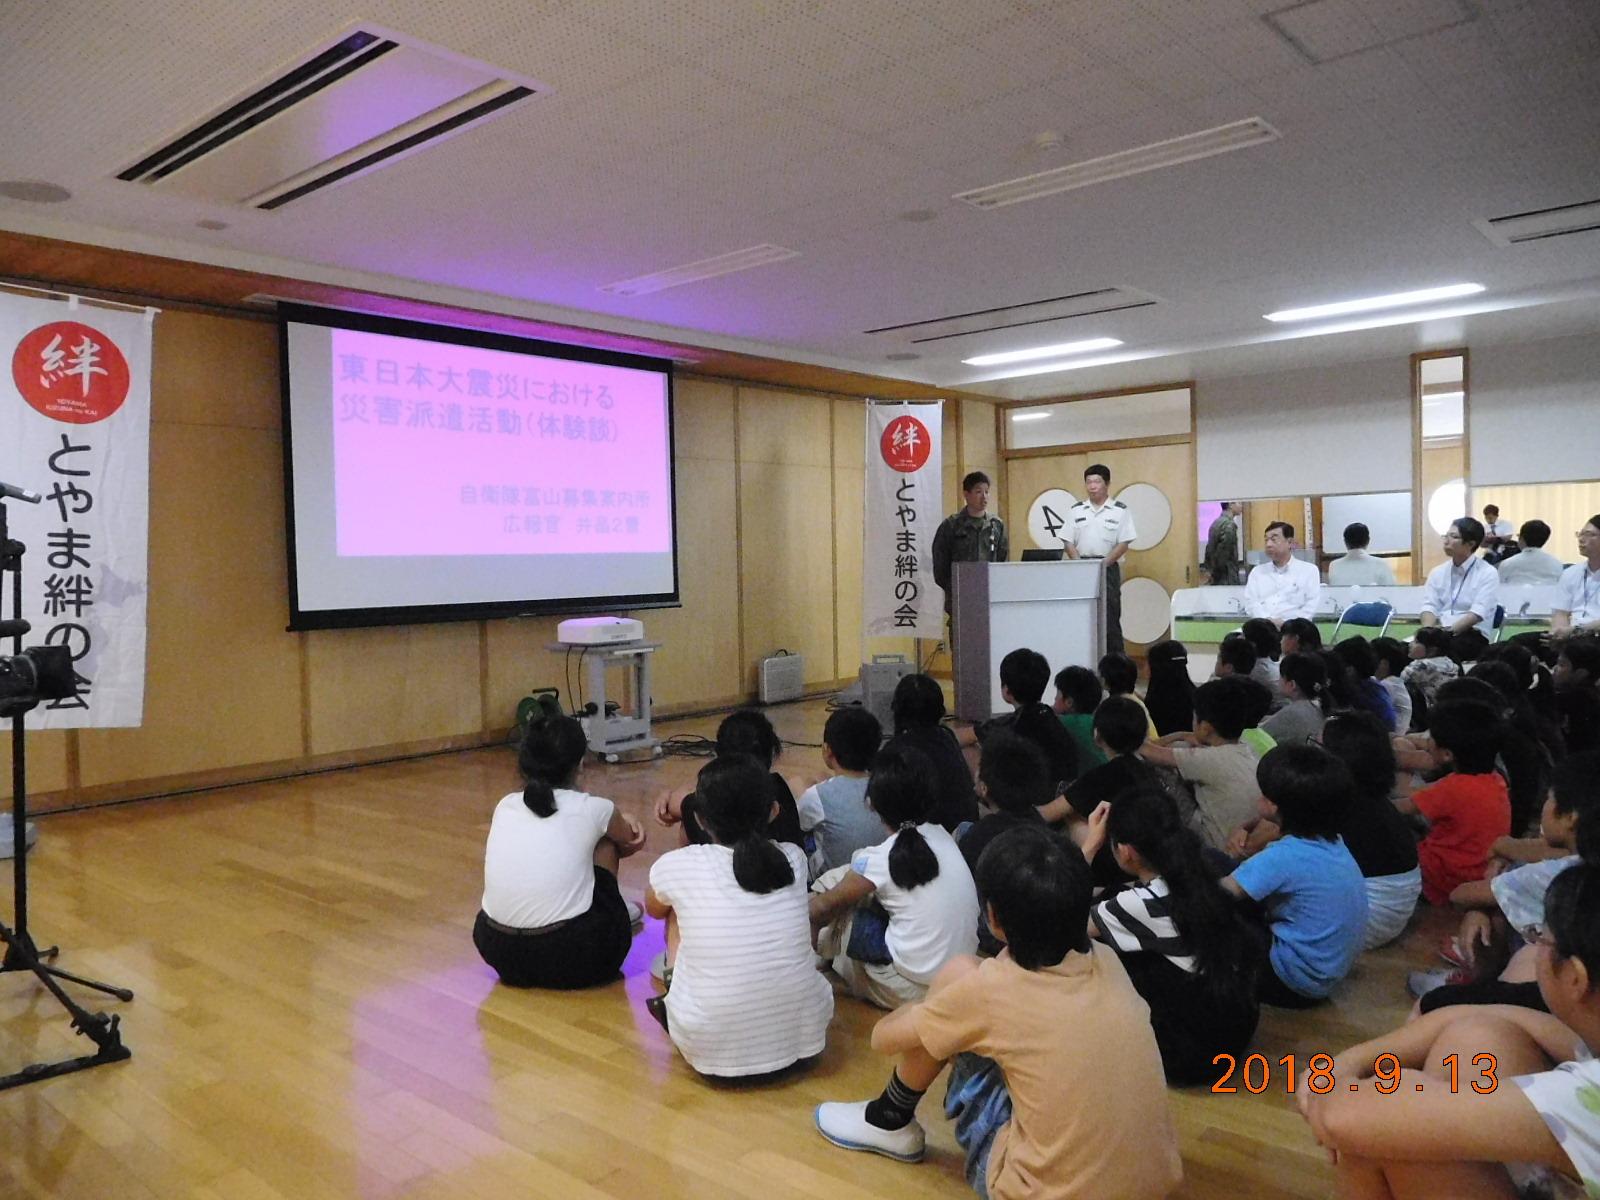 http://kizuna-toyama.net/blog/schoolphoto1.JPG